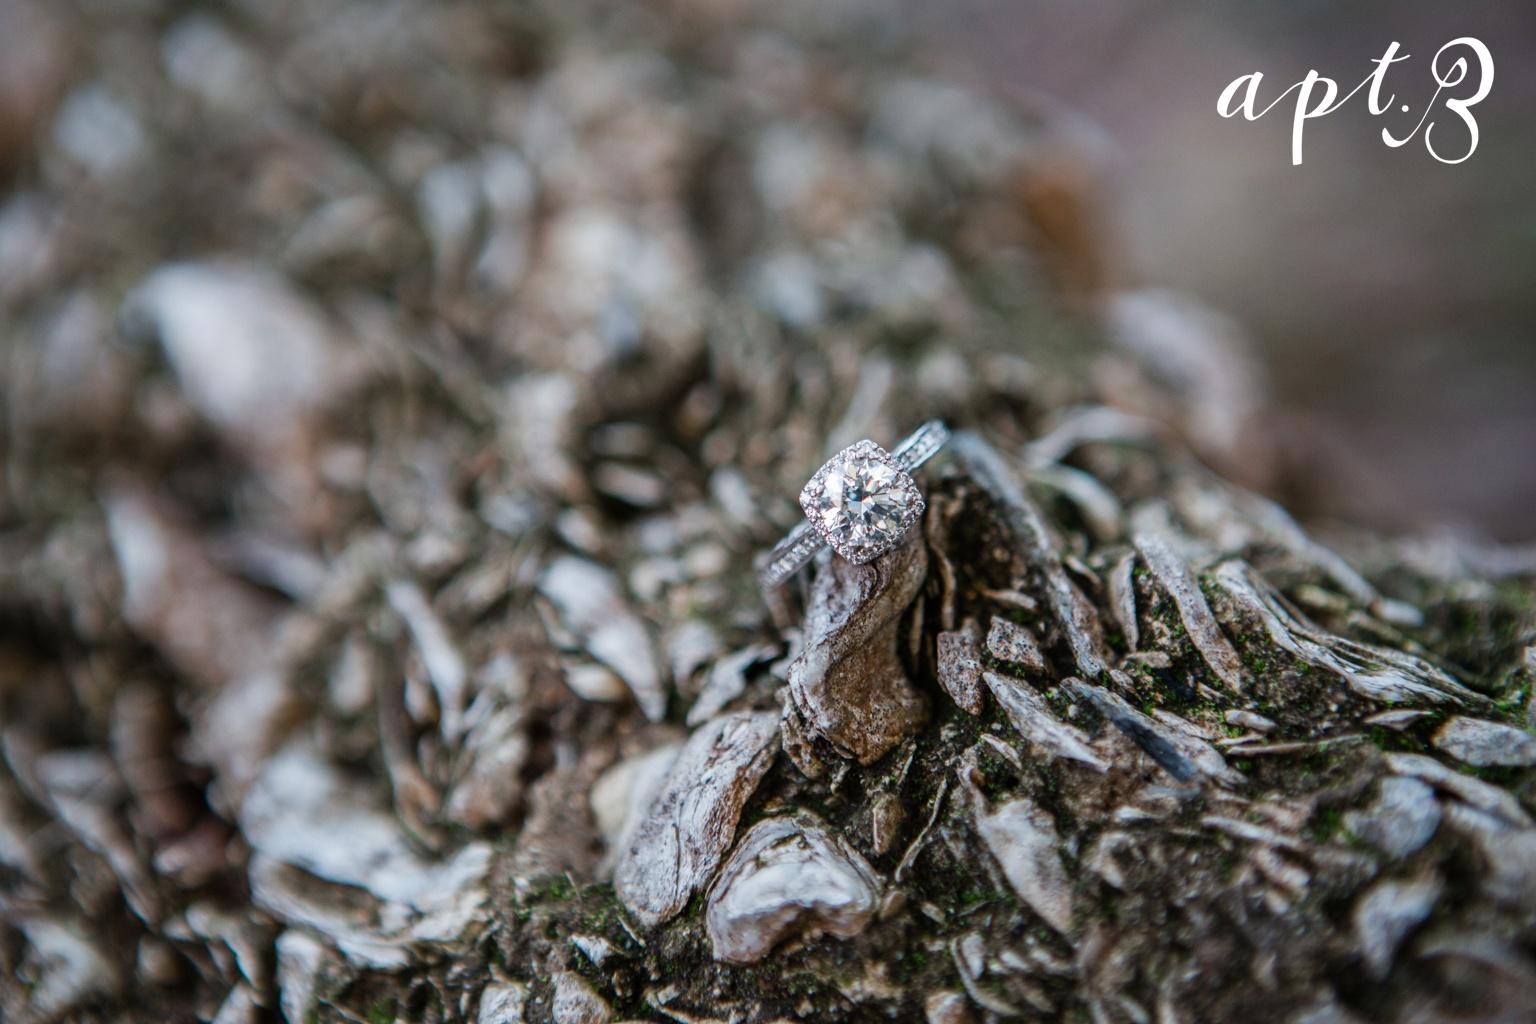 AptBPhotography_KirstieCarlosTOBLOG-49.jpg